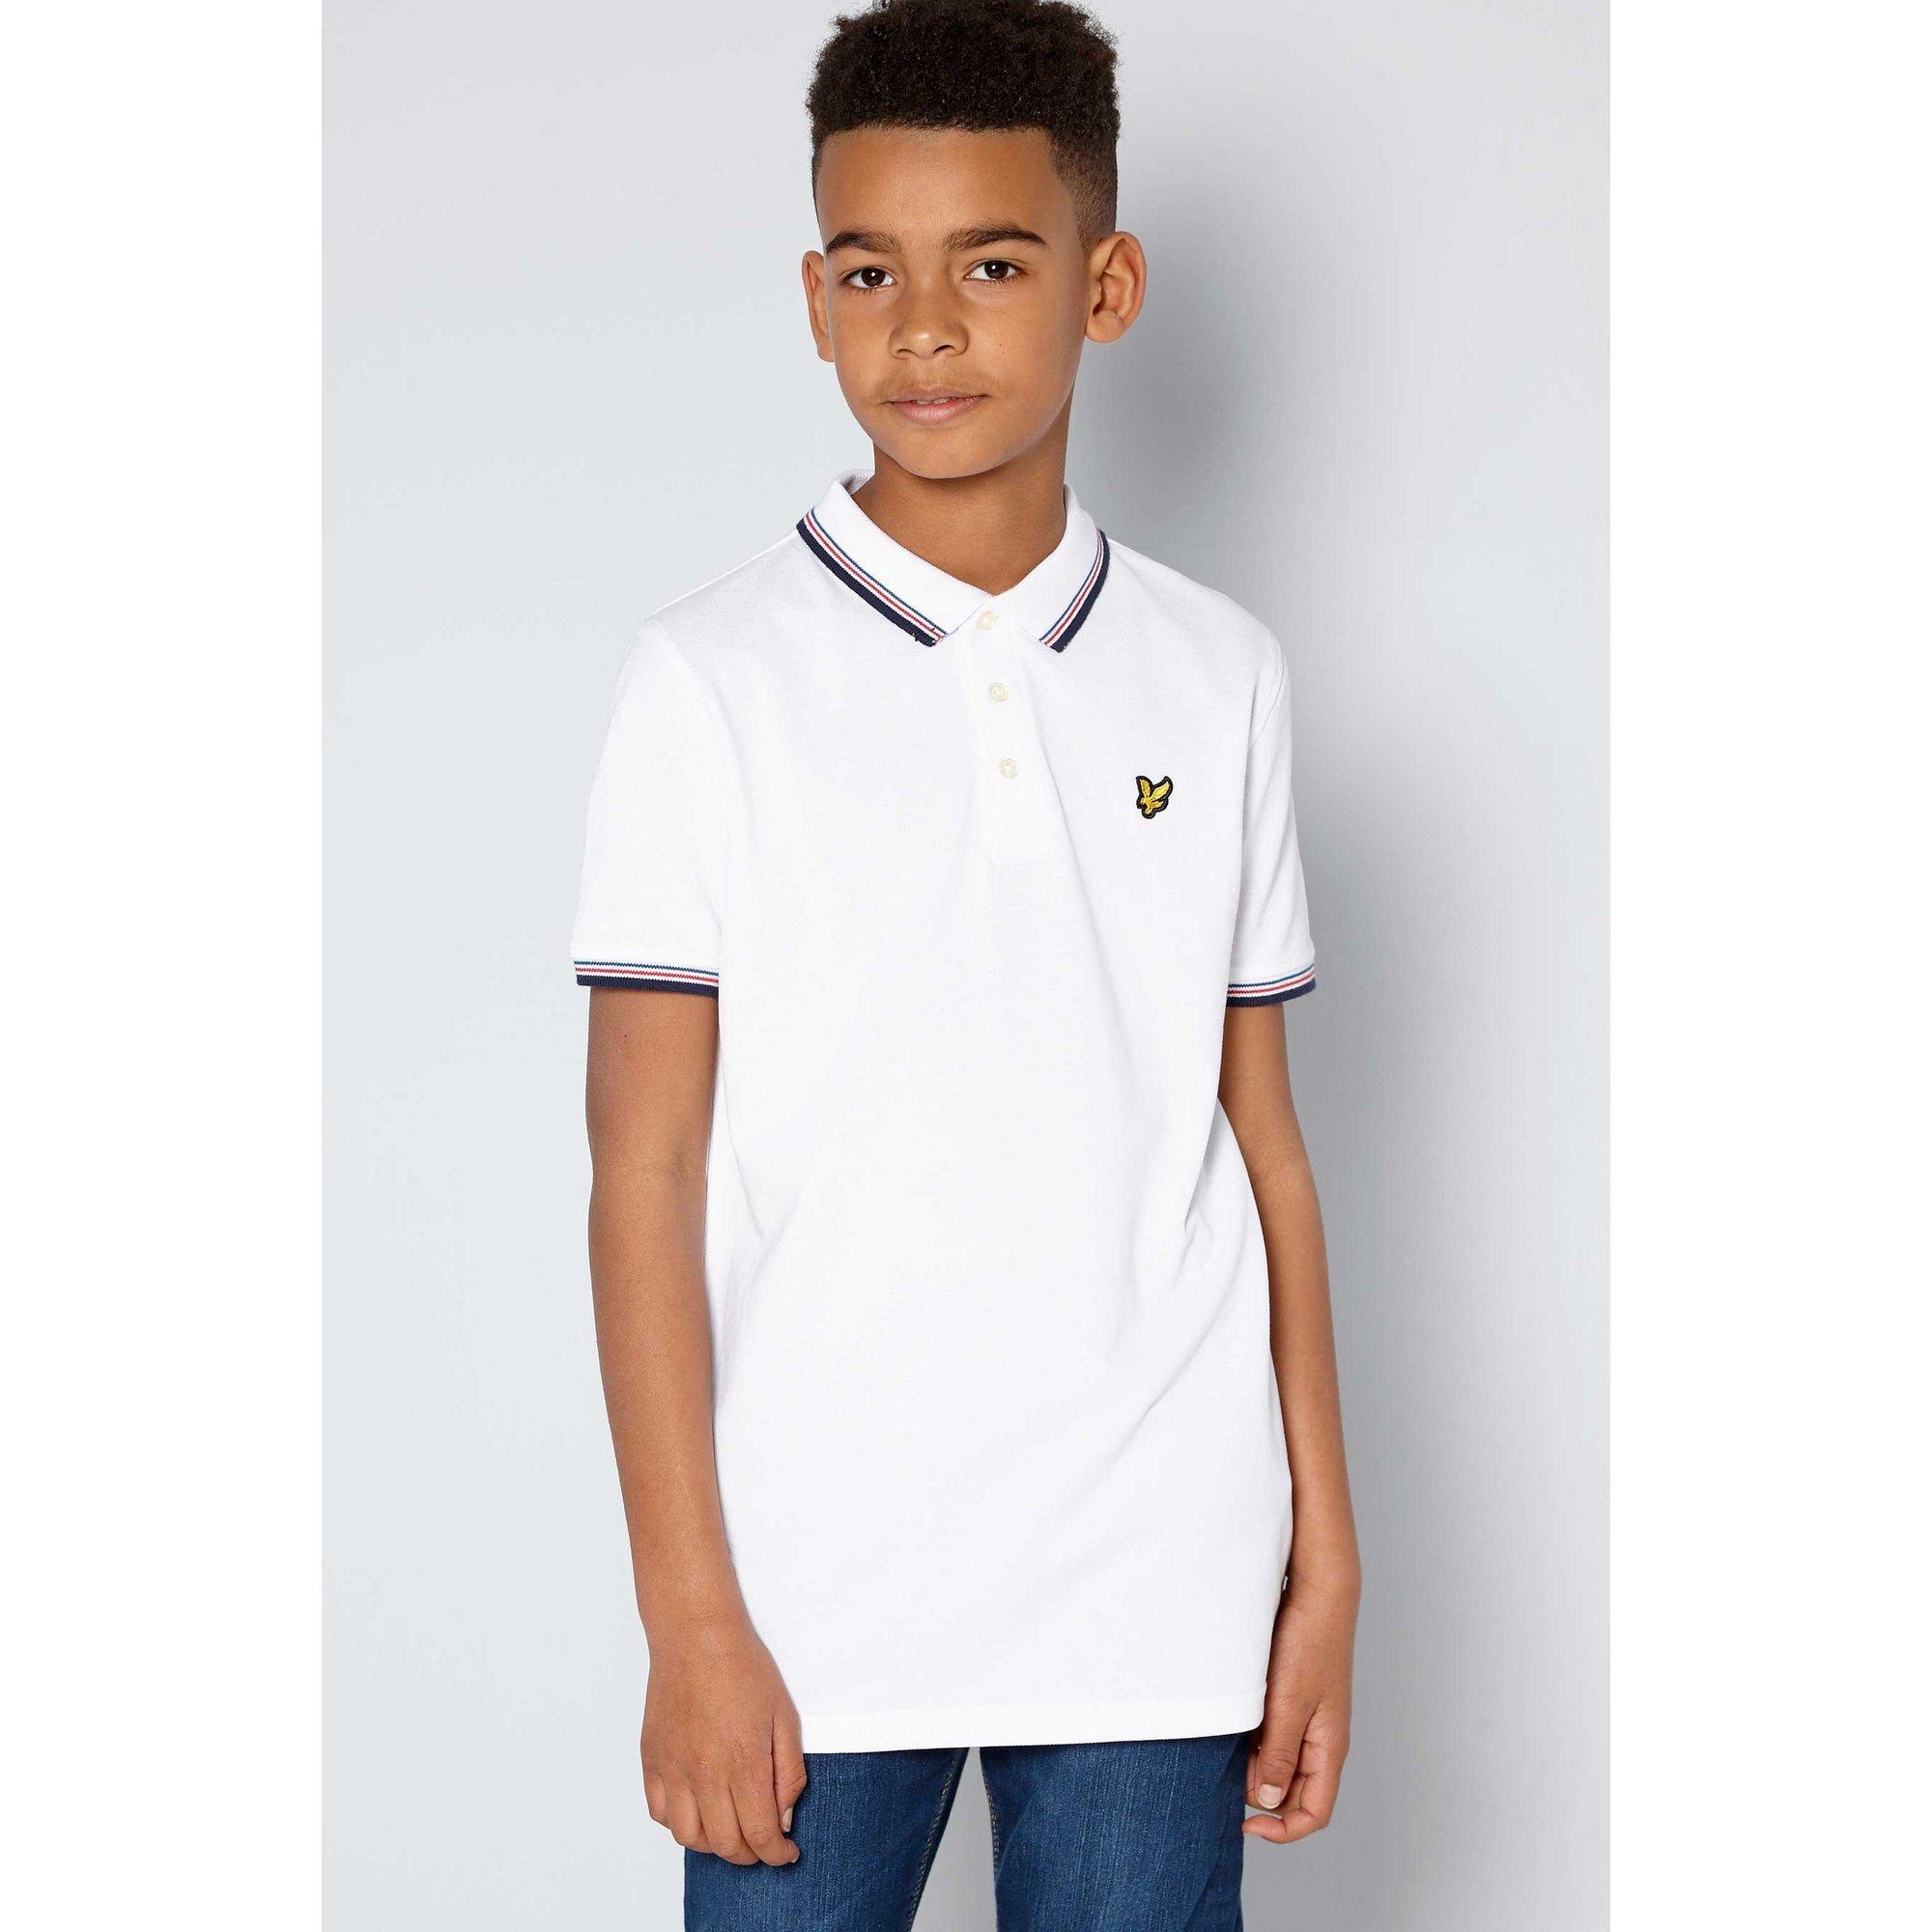 Image of Boys Lyle and Scott Plain White Tipped Polo Shirt